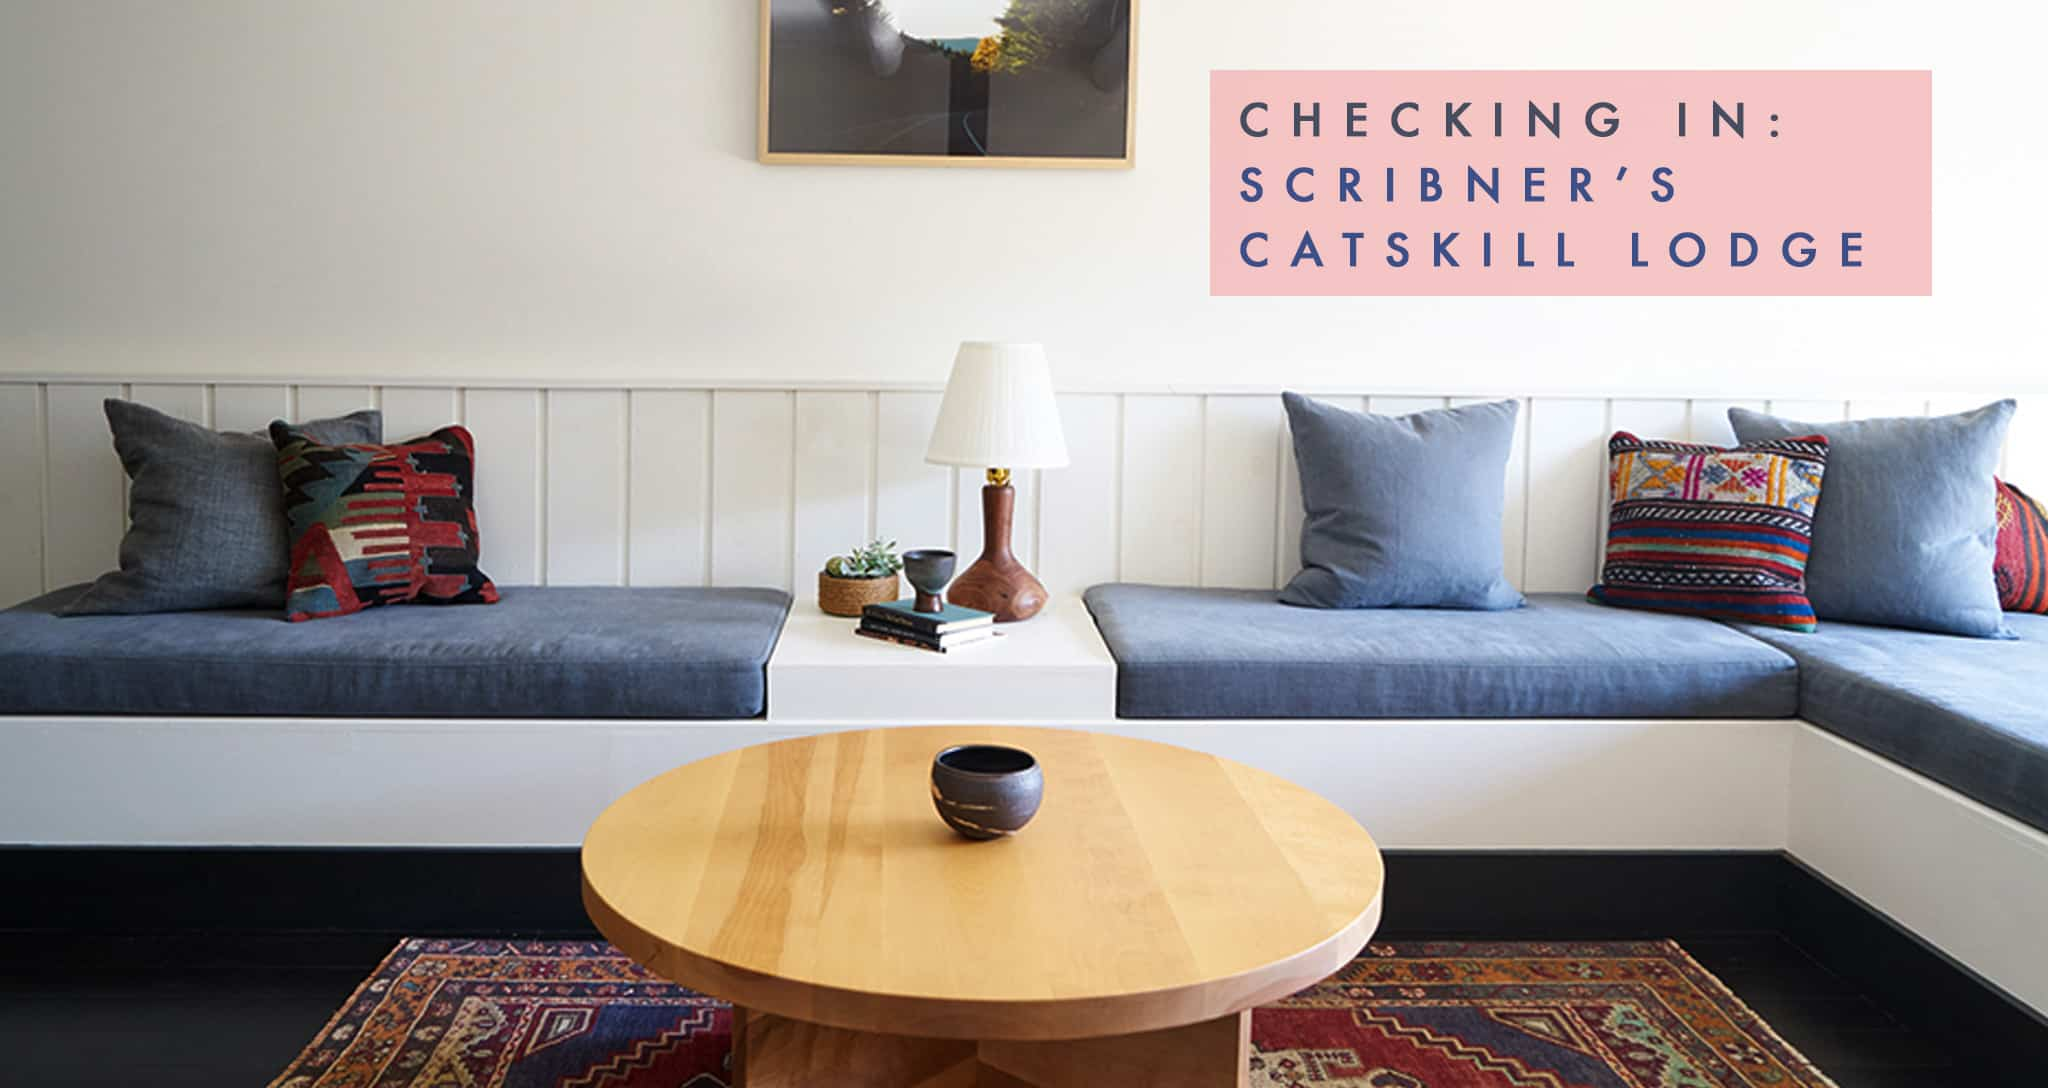 Checking In: Scribner's Catskill Lodge